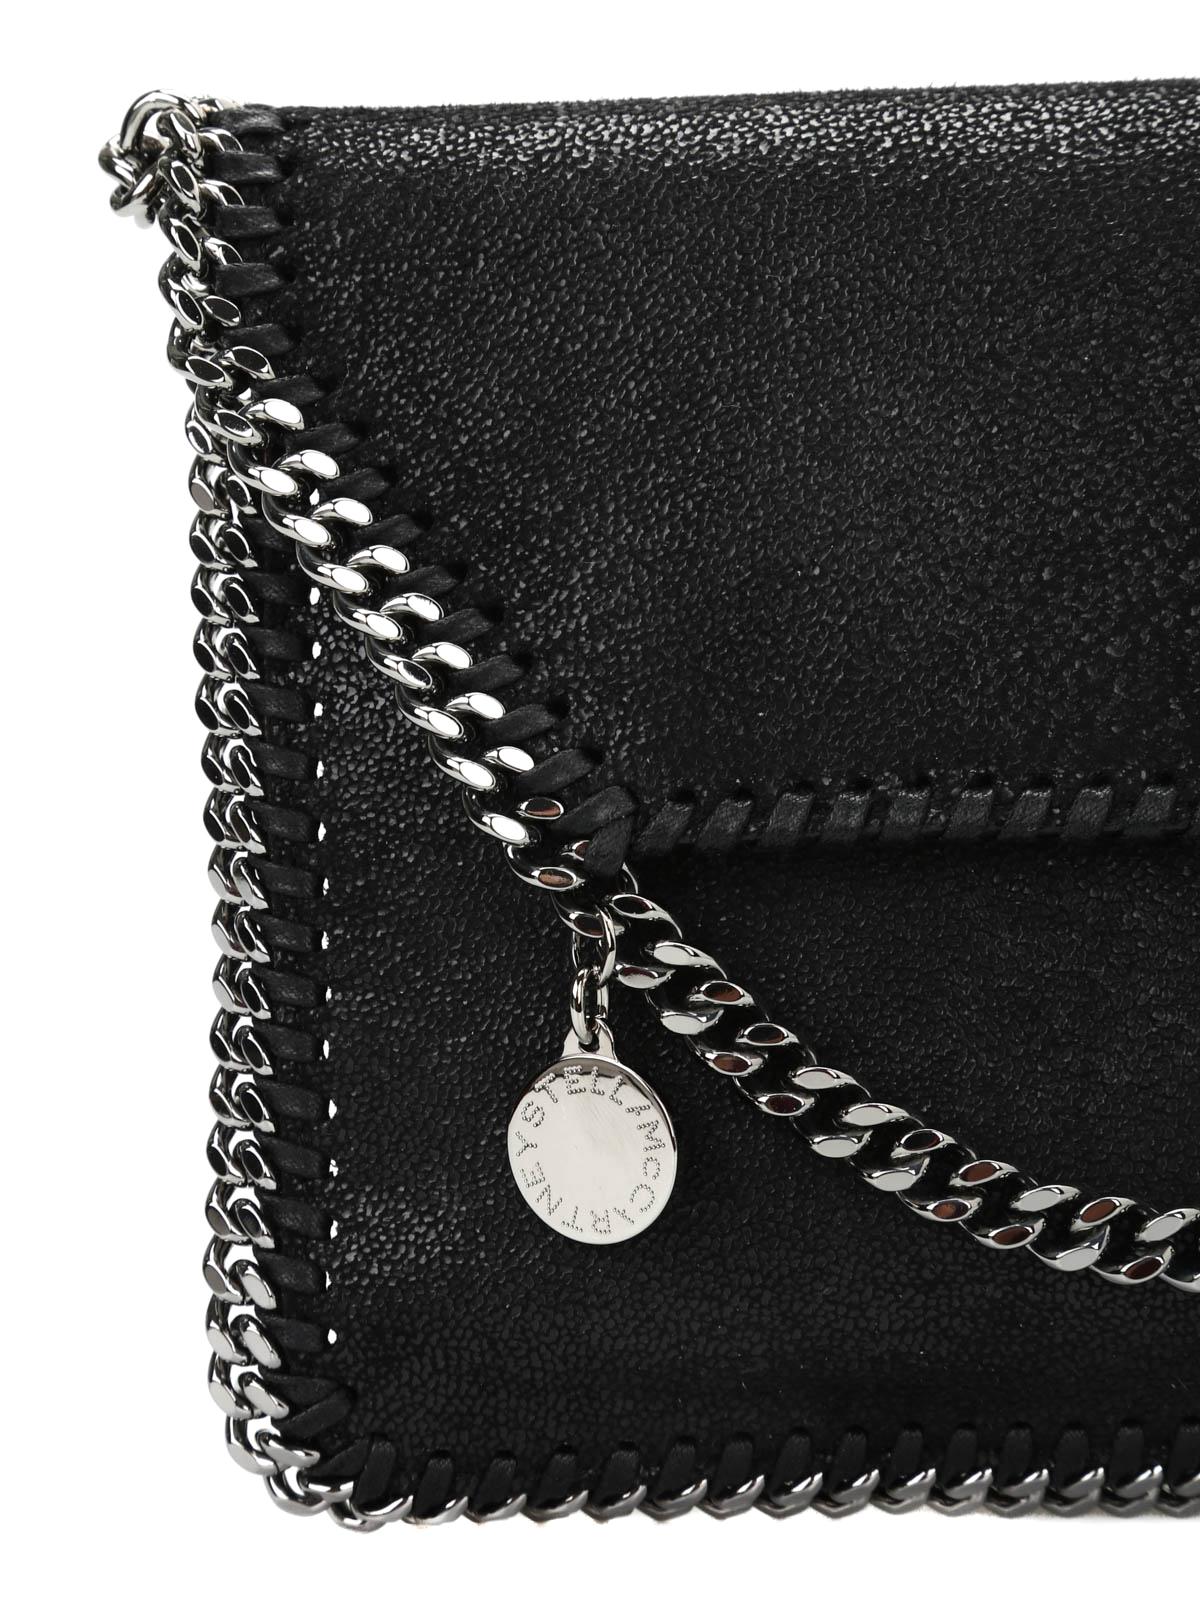 Stella Mccartney Chain Crossbody Bag Cross Body Bags